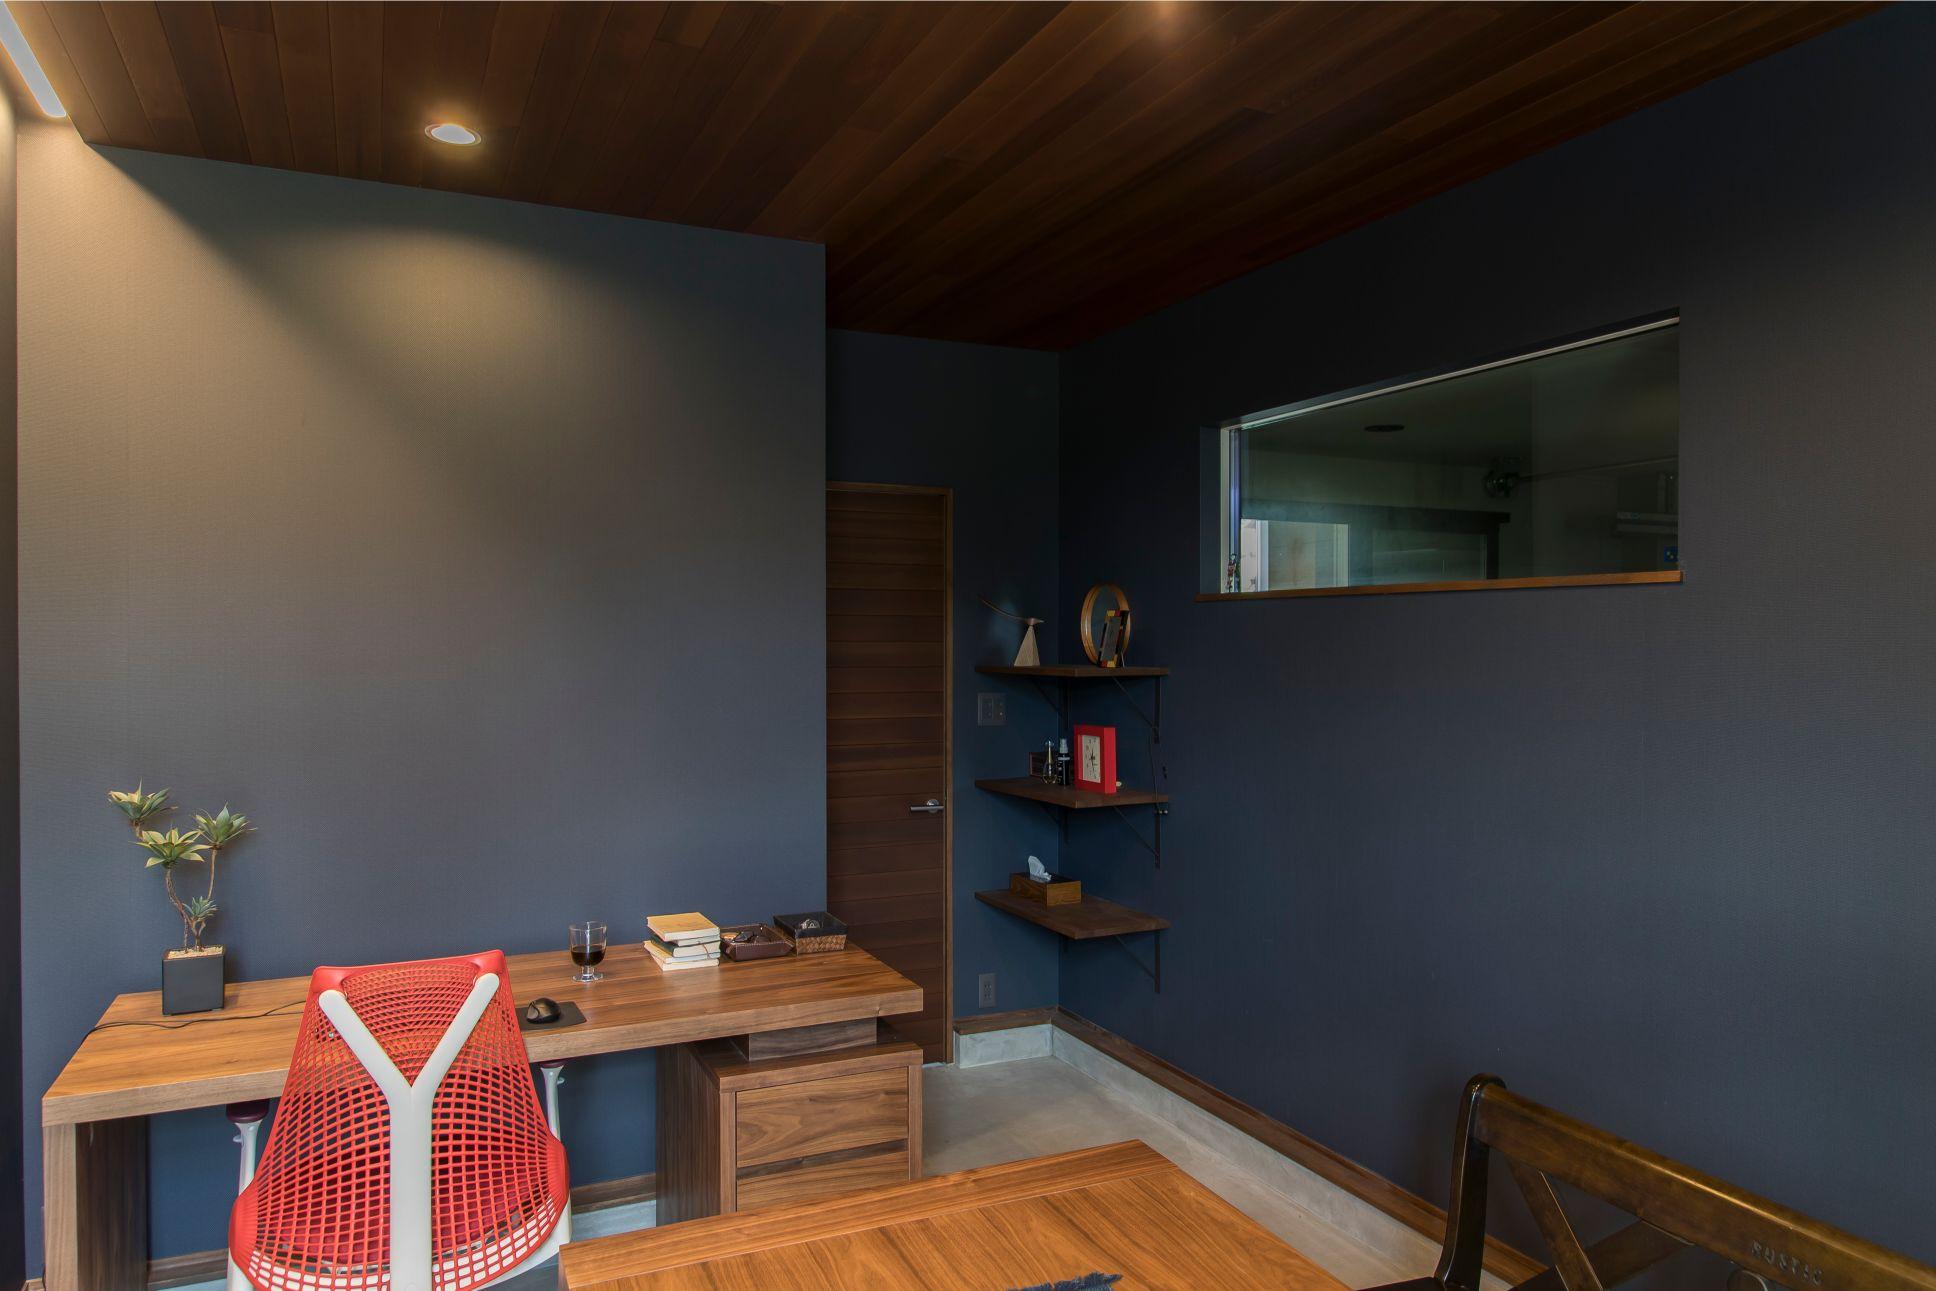 RIKYU (リキュー)【デザイン住宅、建築家、ガレージ】仕事仲間との会合の場にもなっている書斎。落ち着いたトーンでシックに仕上げられている